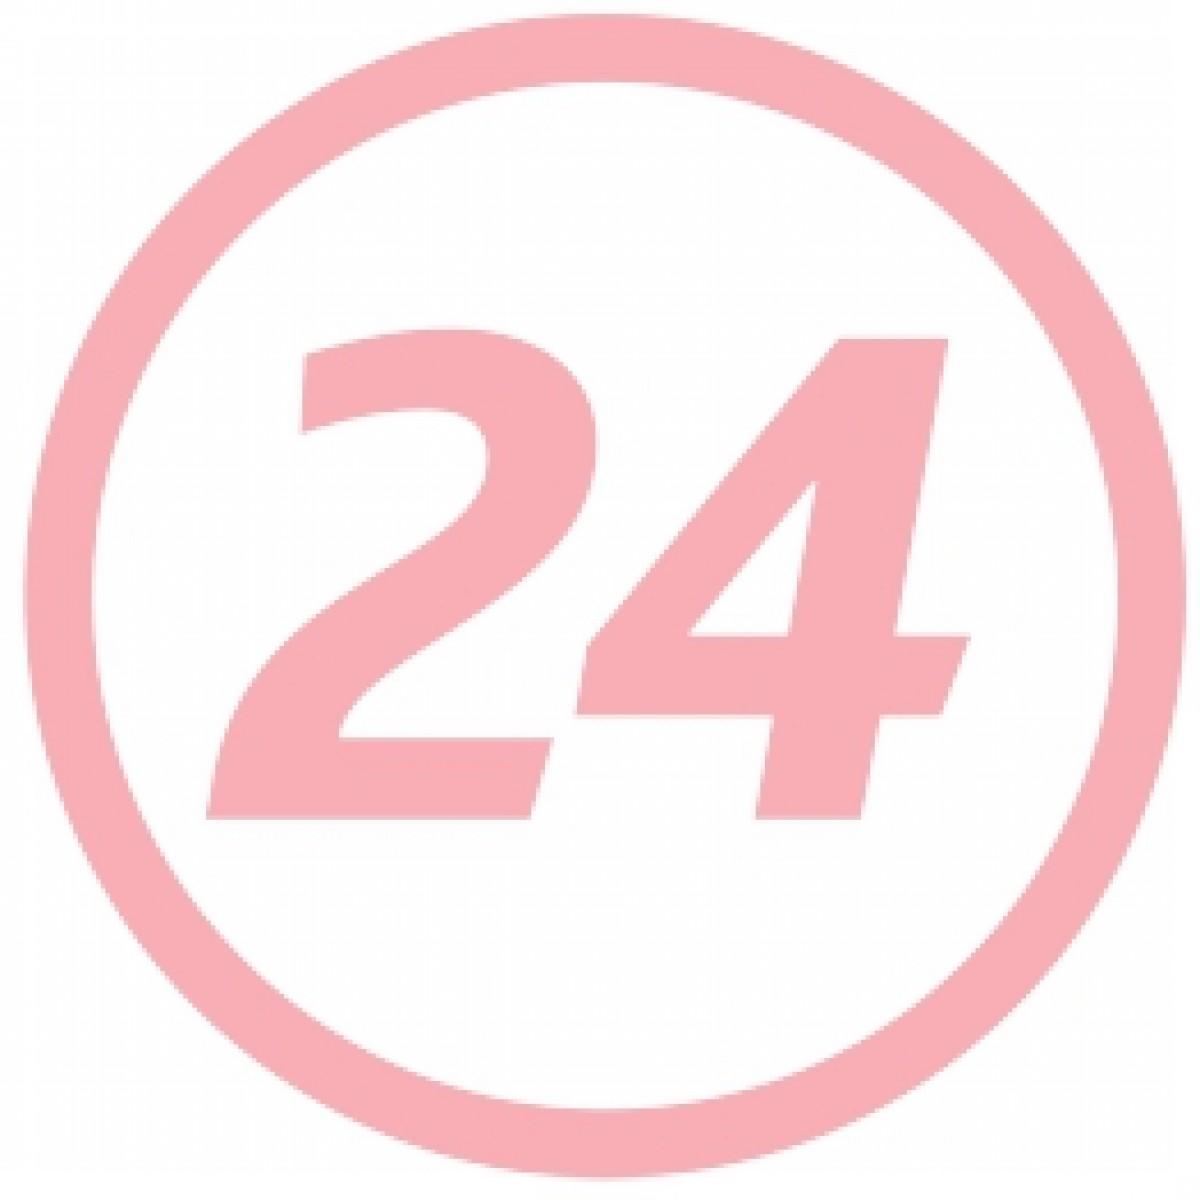 Gerovital H3 Derma+ Sampon Pentru Scalp Sensibil, Sampon, 200ml